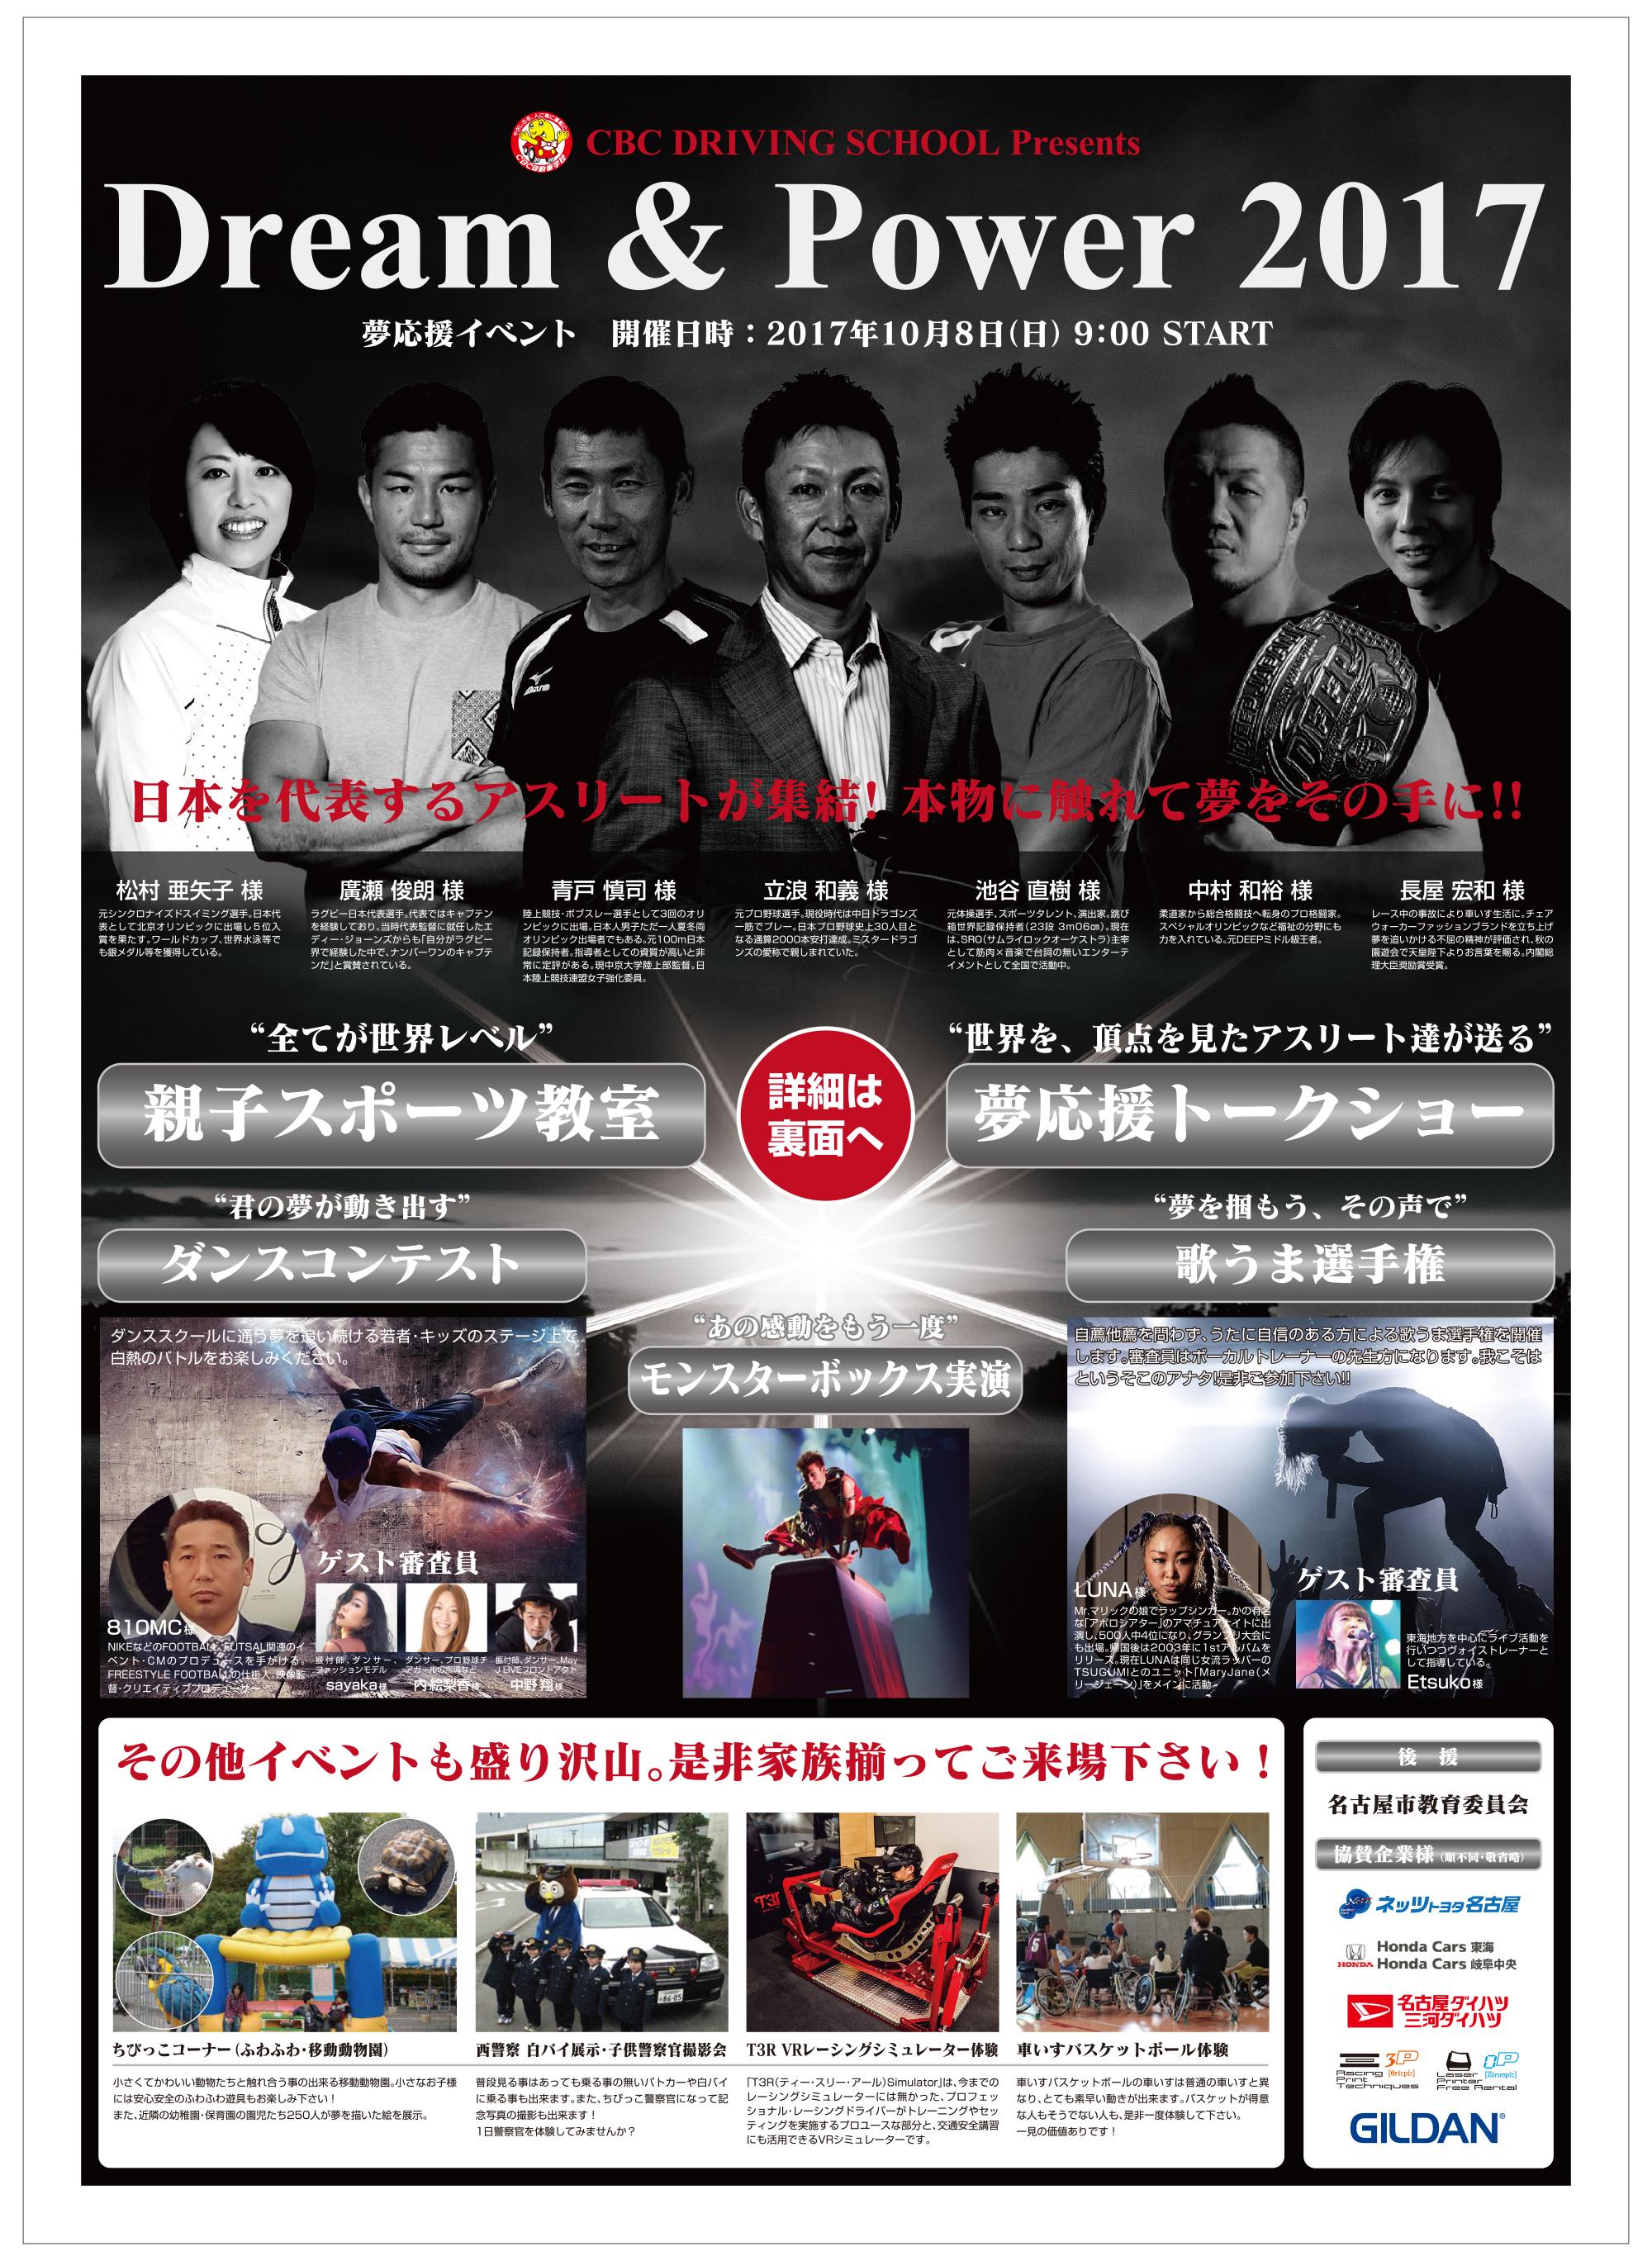 http://jcctokyo.com/news/omote.jpg